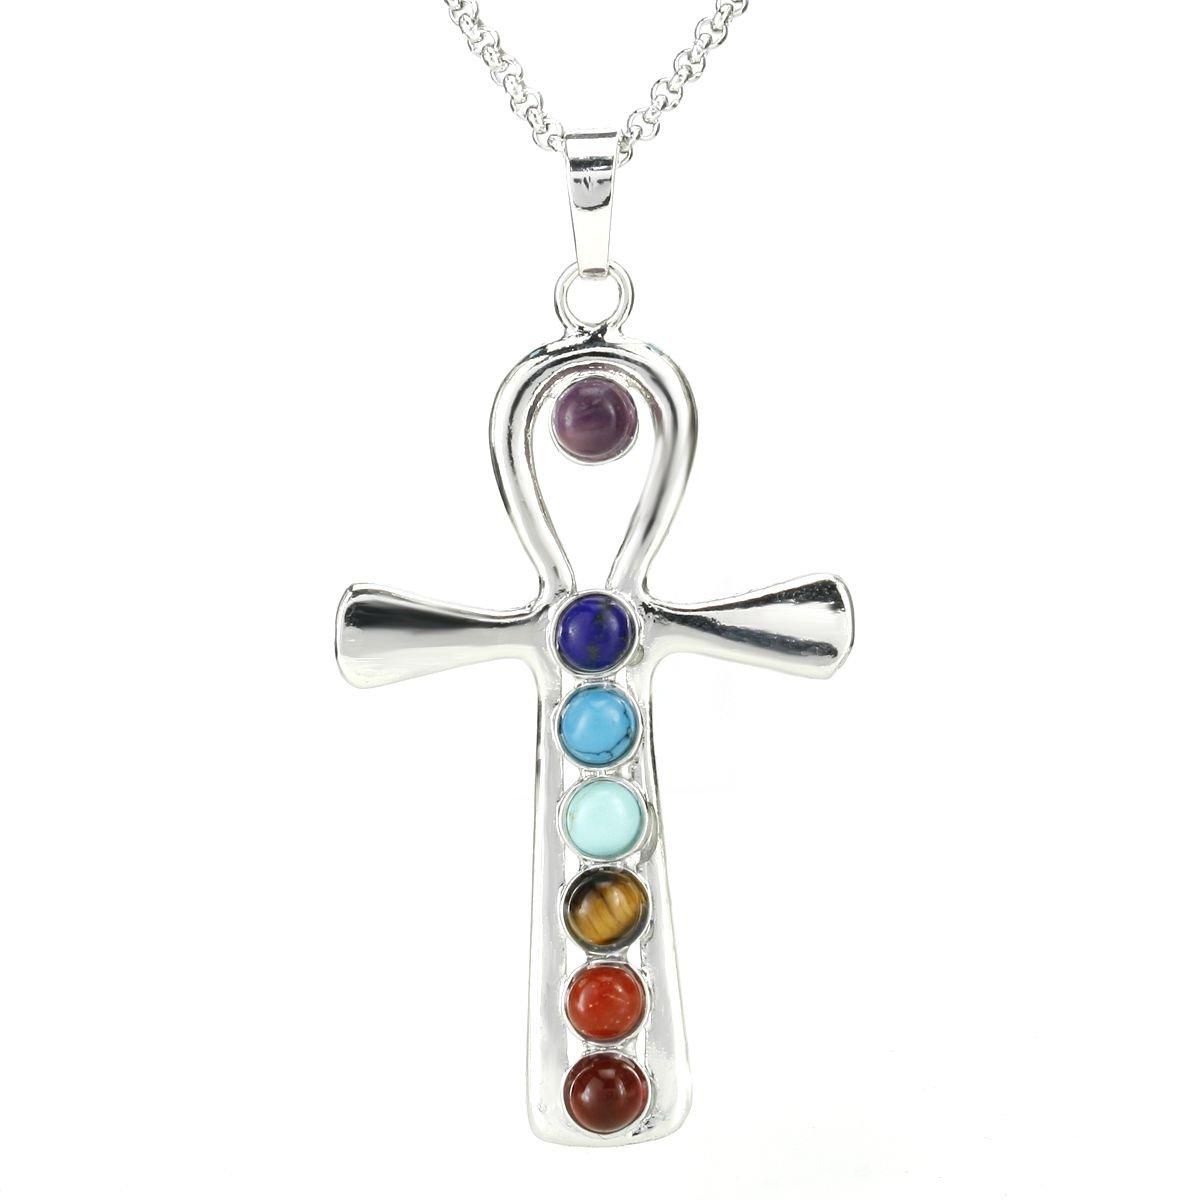 7 chakras necklace